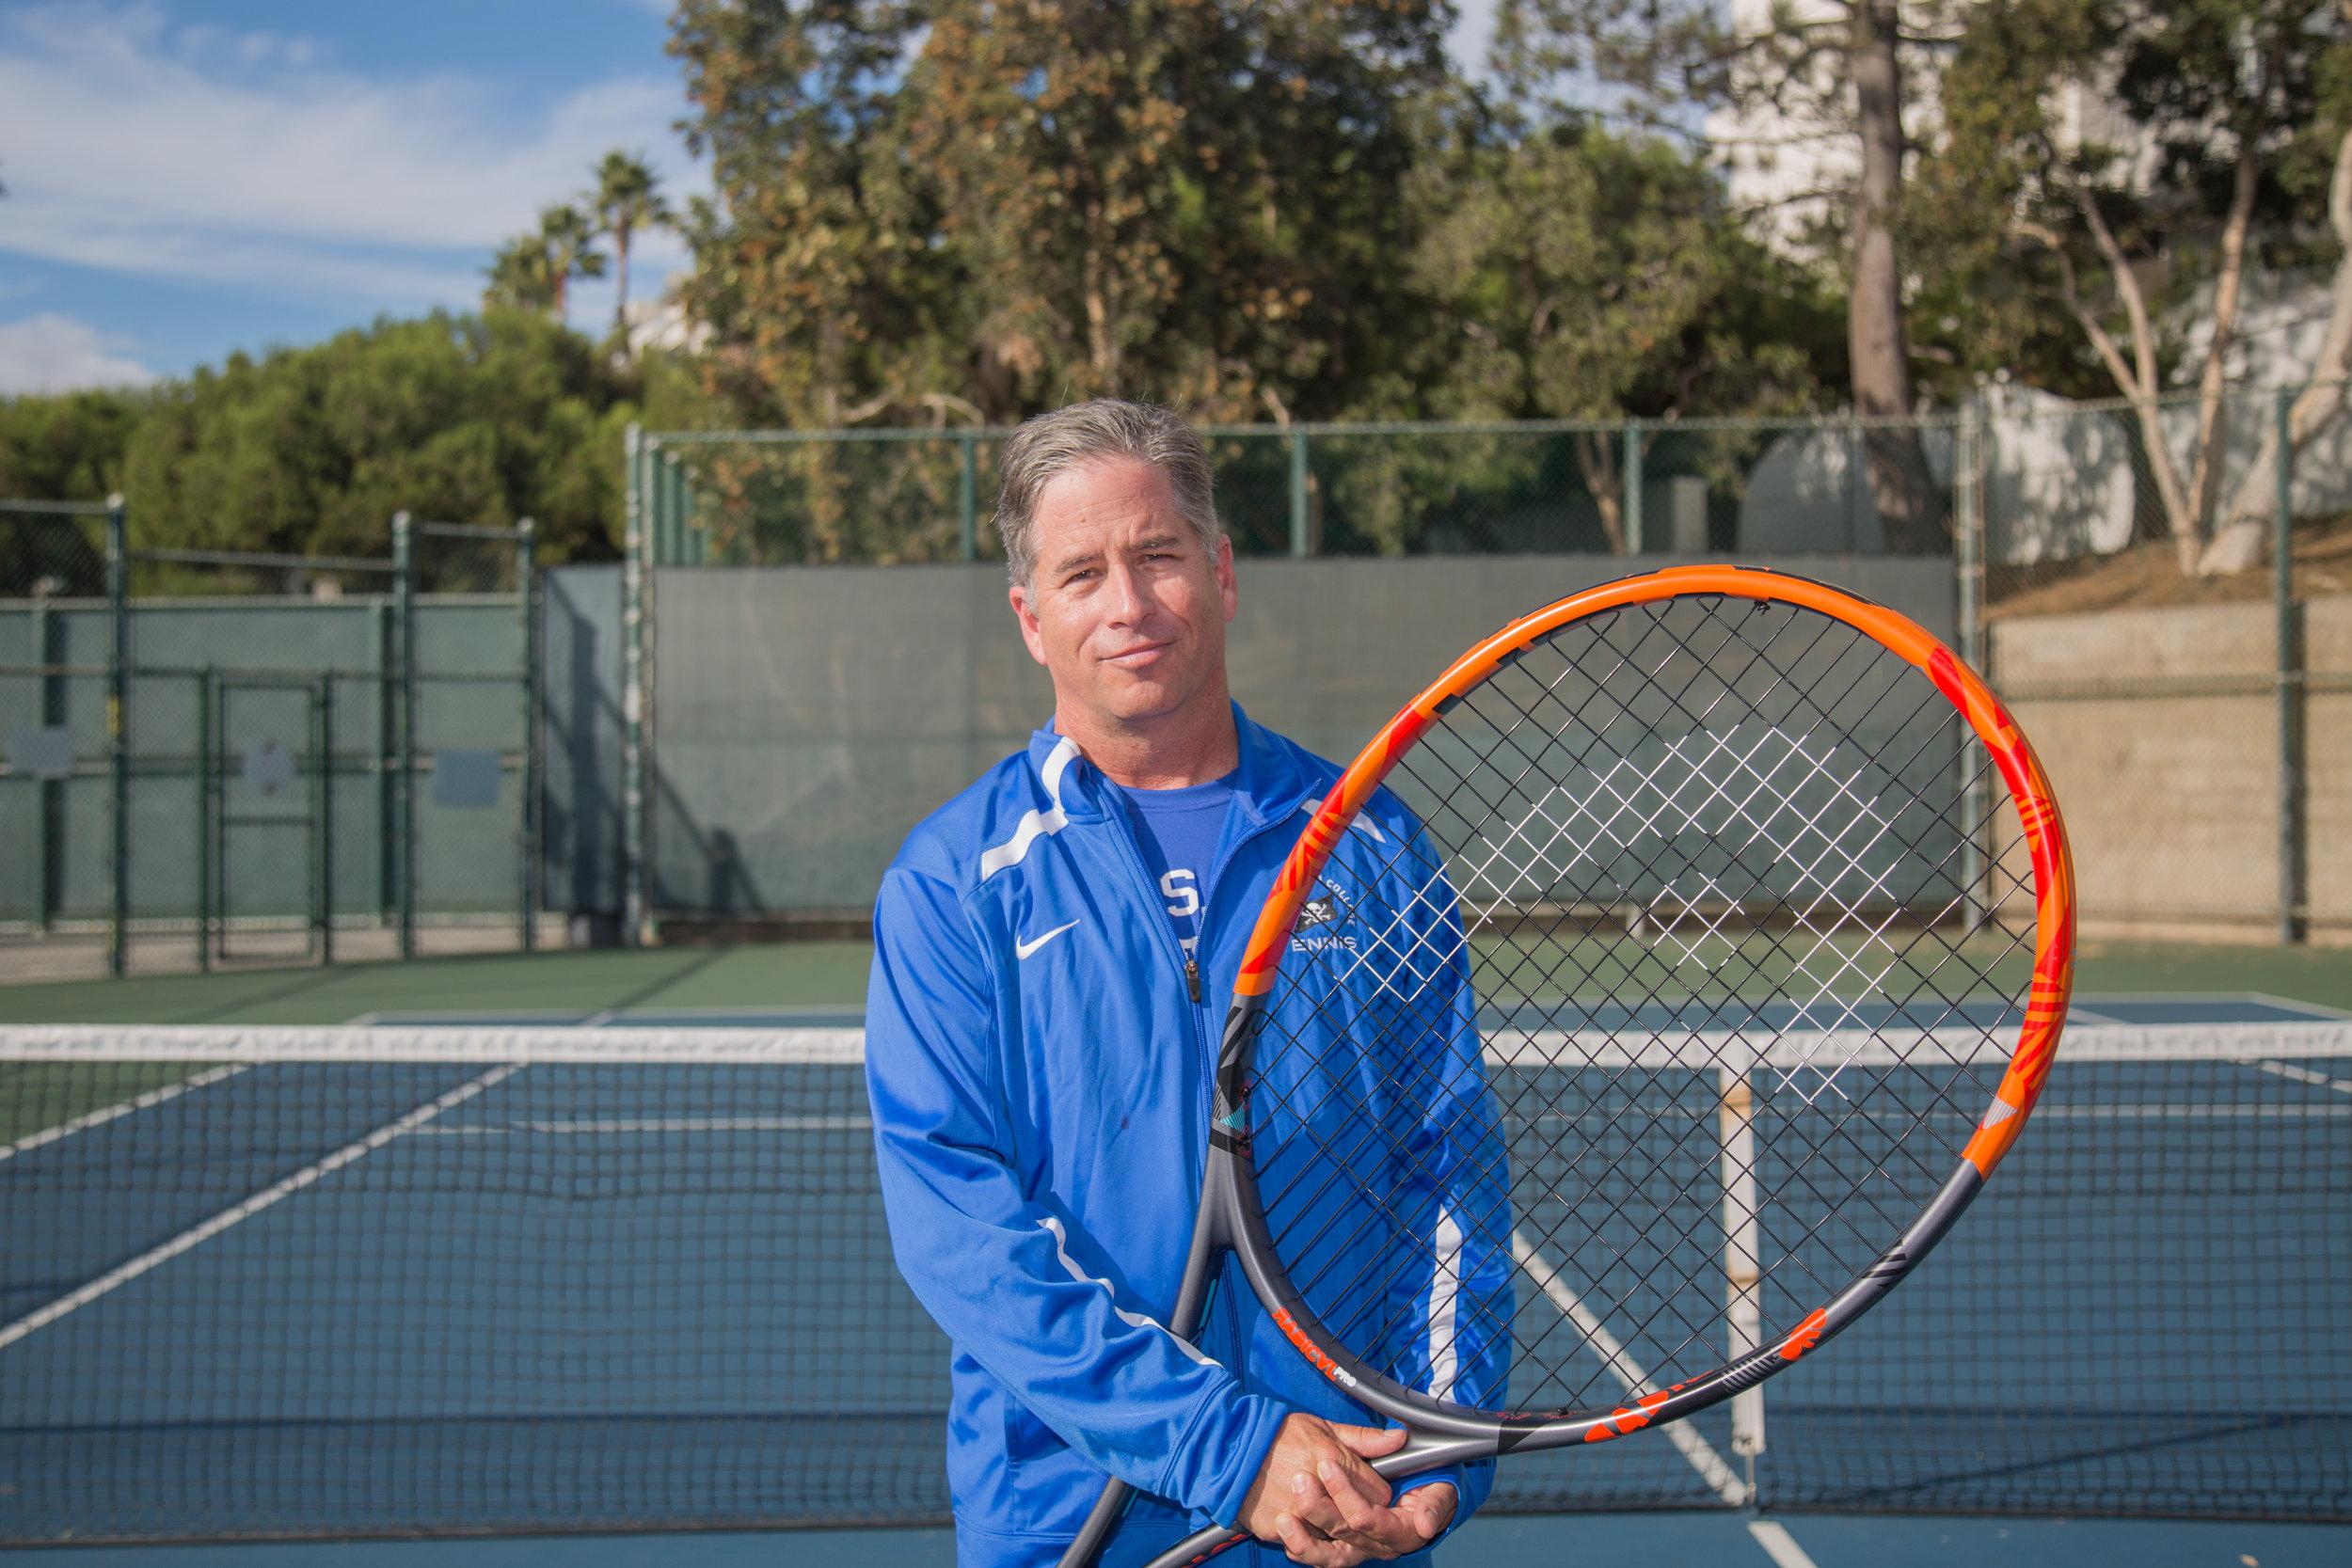 Richard Goldenson, the Head Coach of Women's Tennis Team at Santa Monica College, poses for a portrait at the Ocean View Park Tennis Court in Santa Monica, Calif. on Friday, Nov.17, 2017. (Photo by Yuki Iwamura)